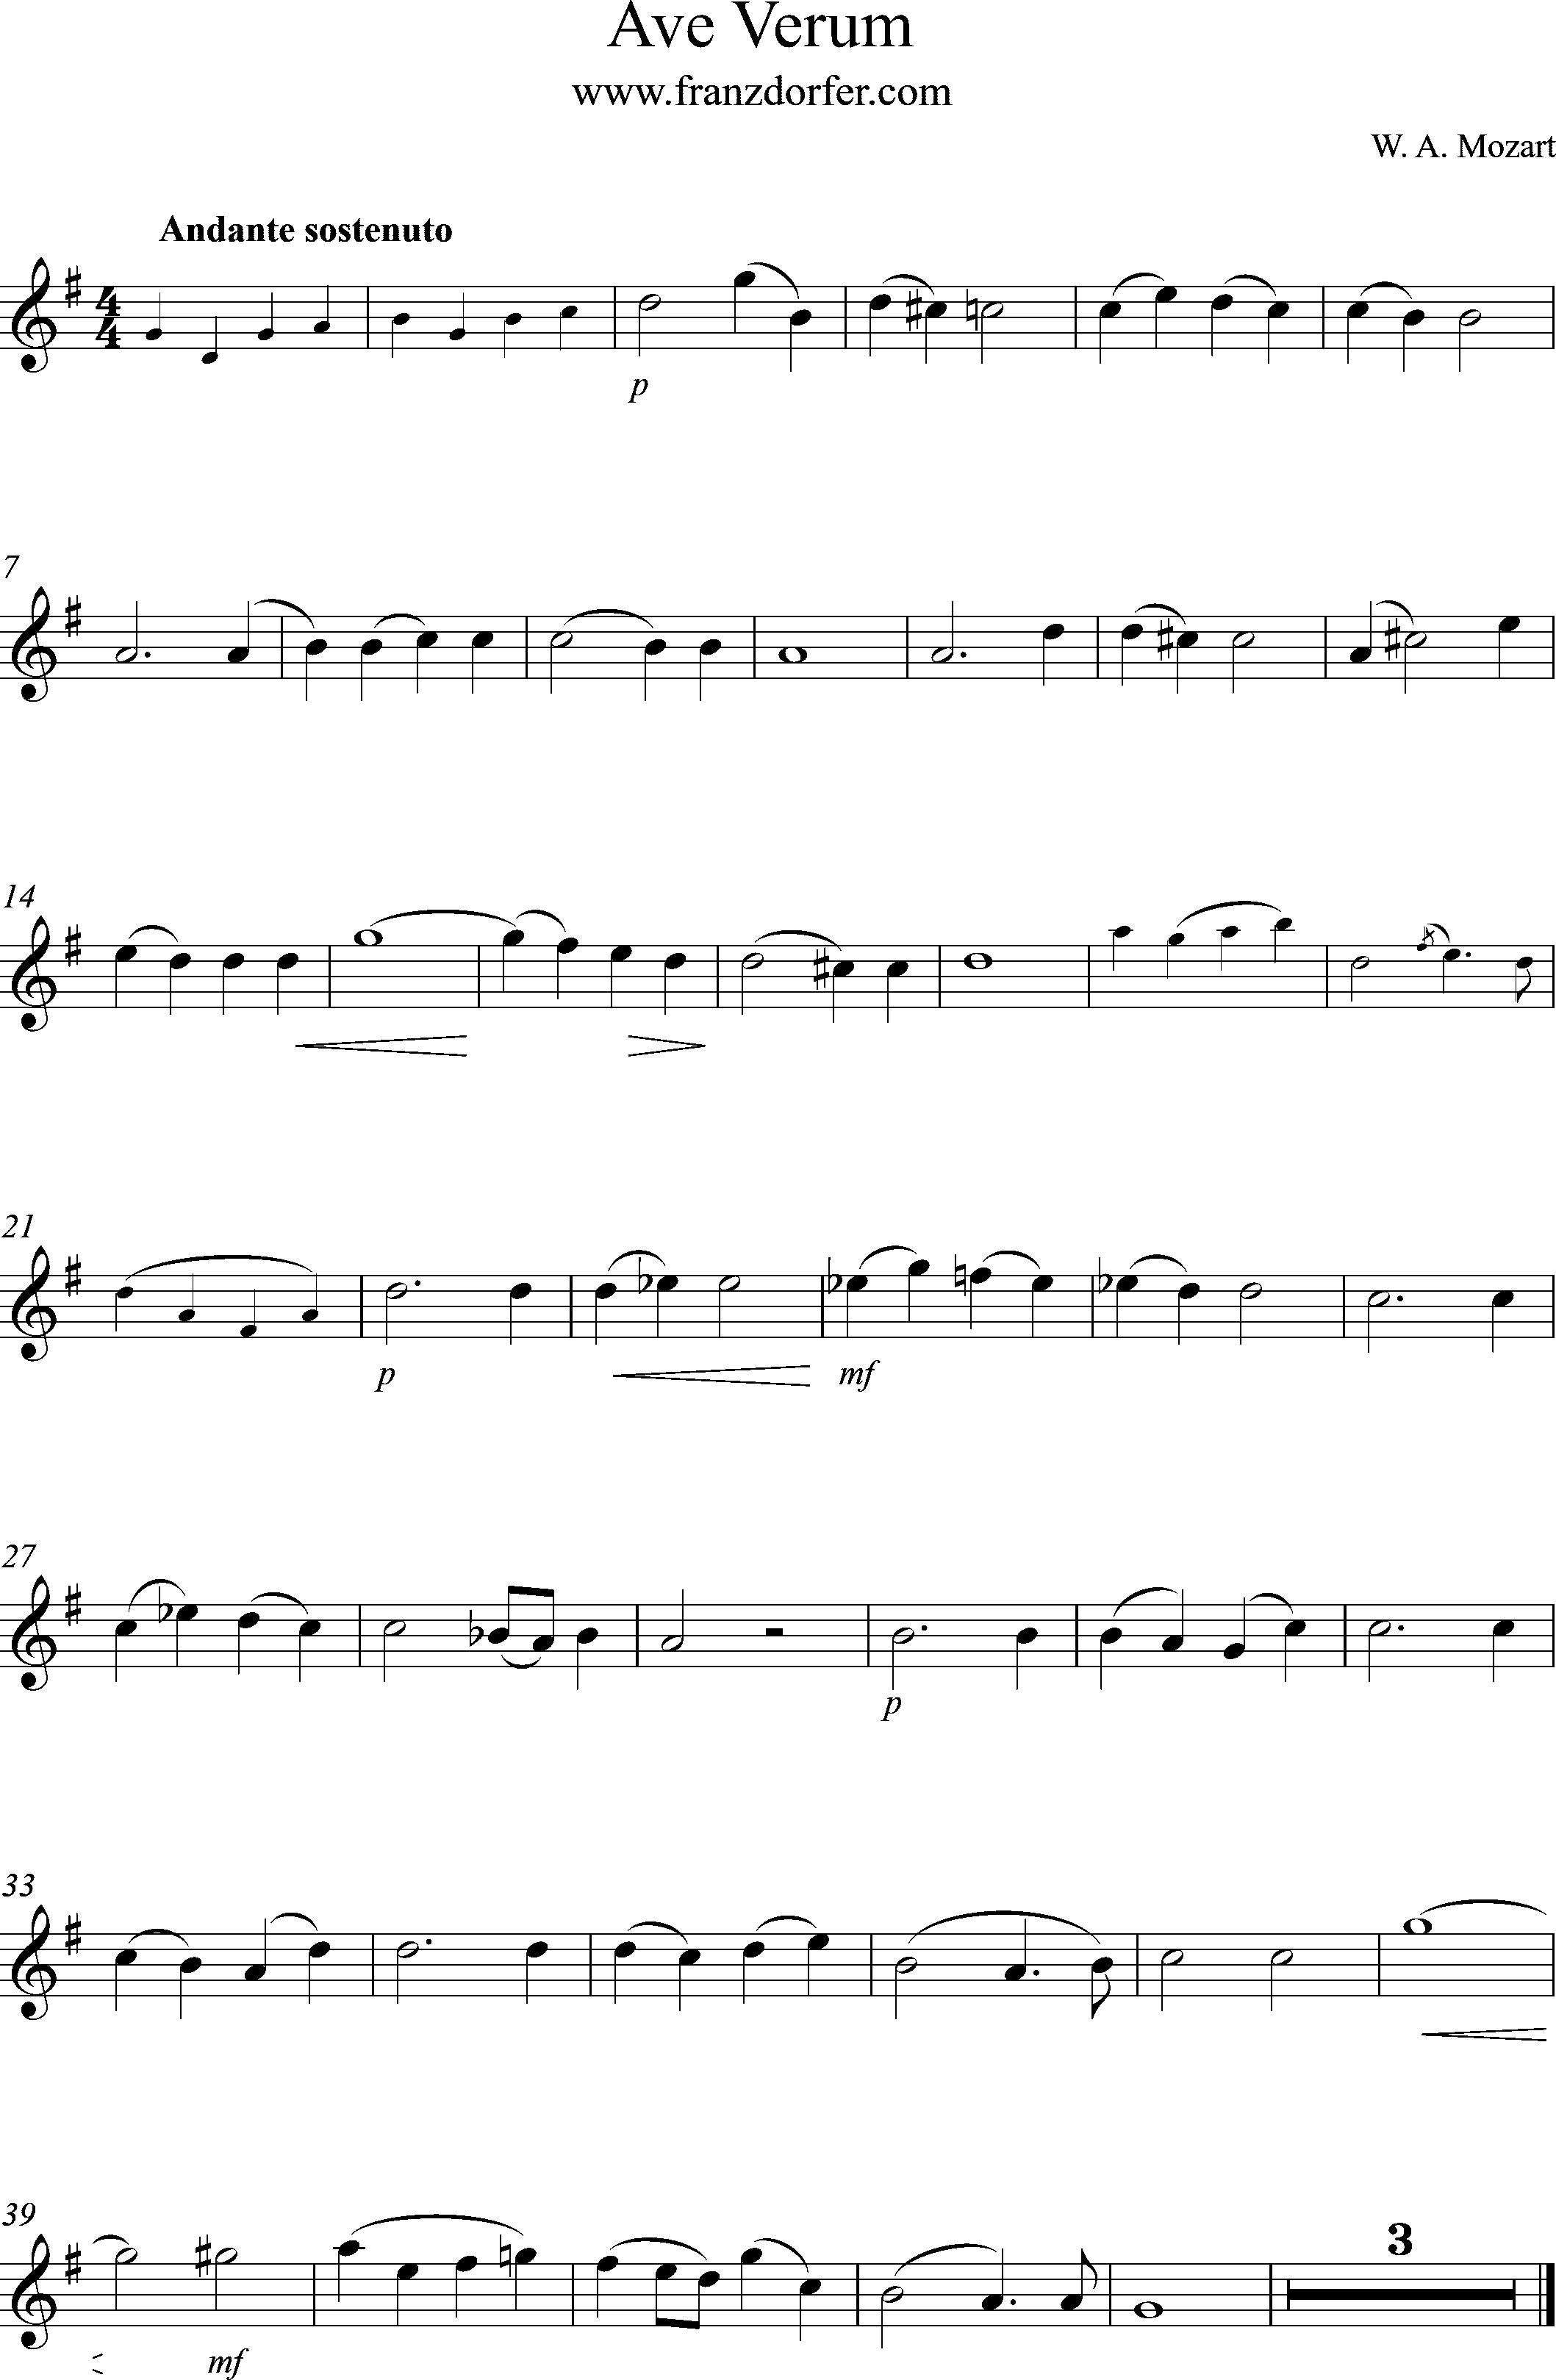 Noten Ave Verum, D-Dur, Solo Stimme